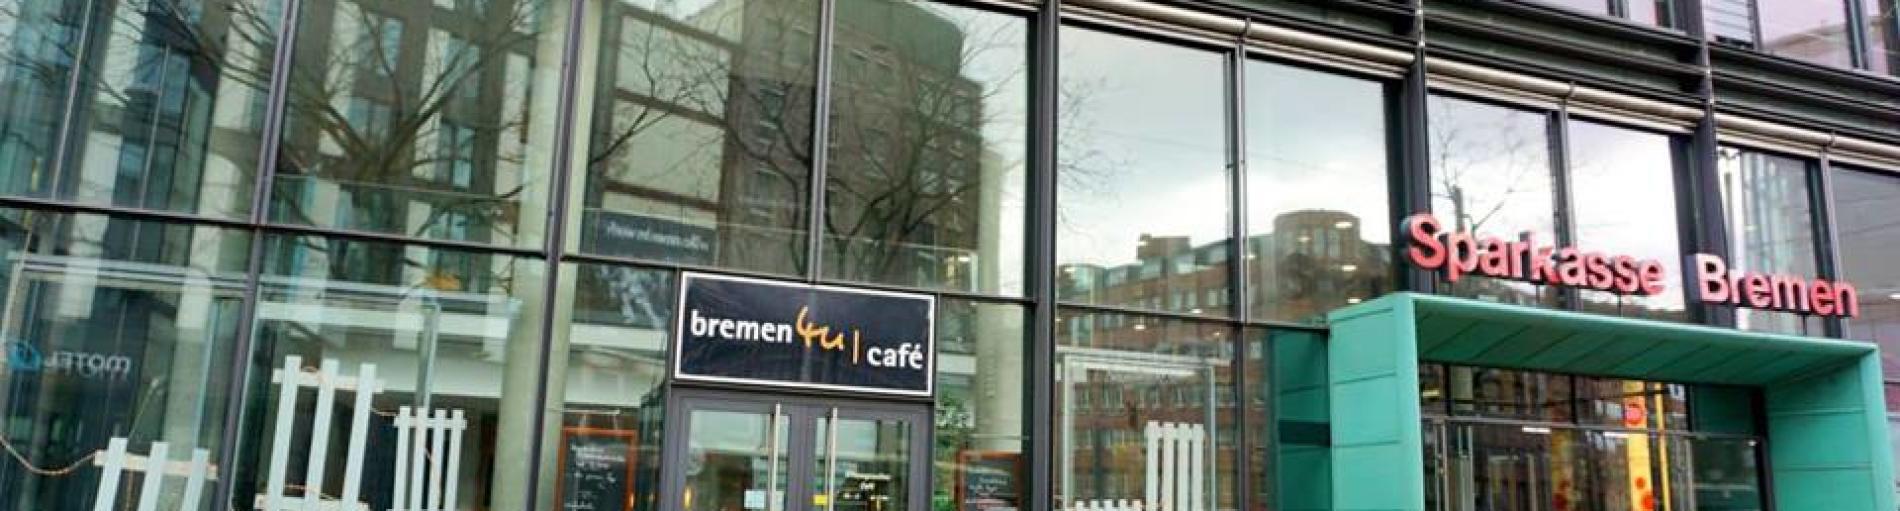 POETRY IM BREMEN4U CAFÉ